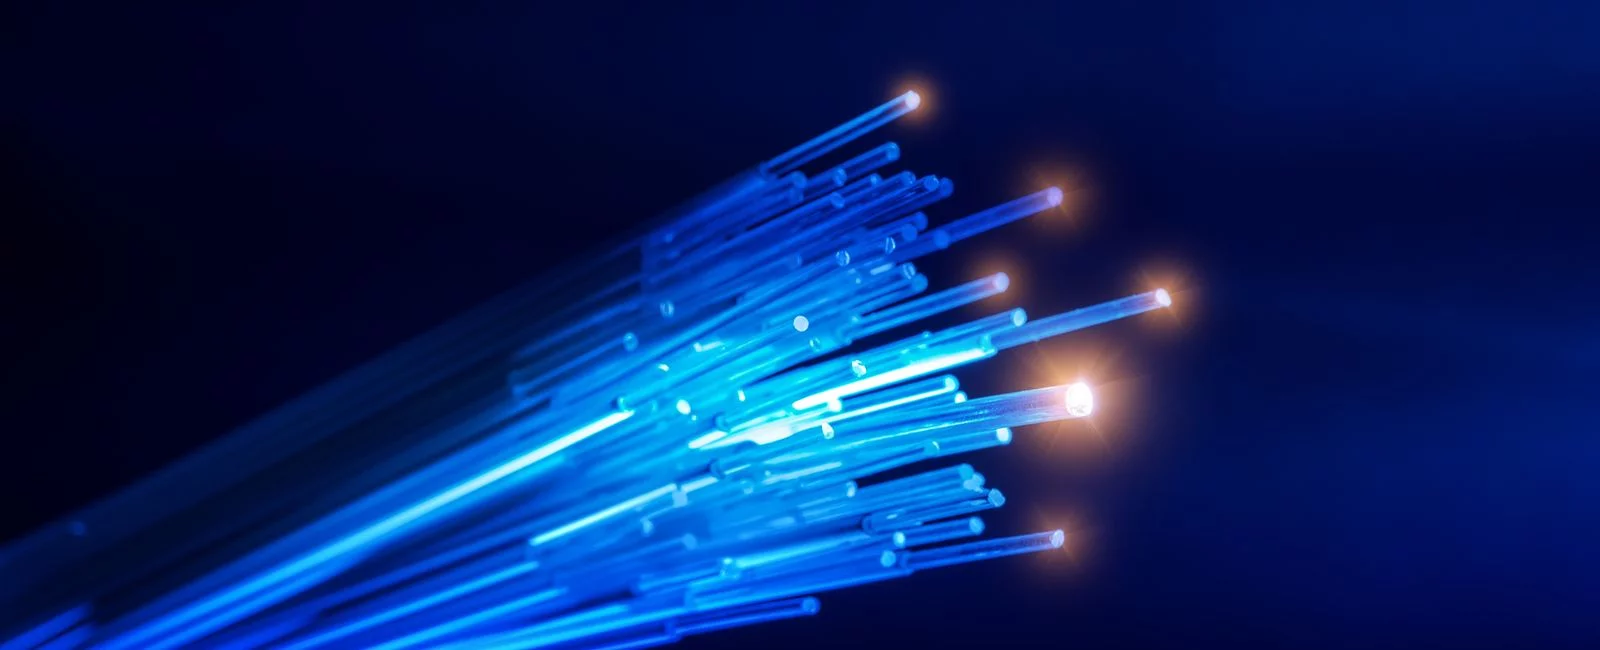 انتقال اطلاعات - شبکه فیبر نوری